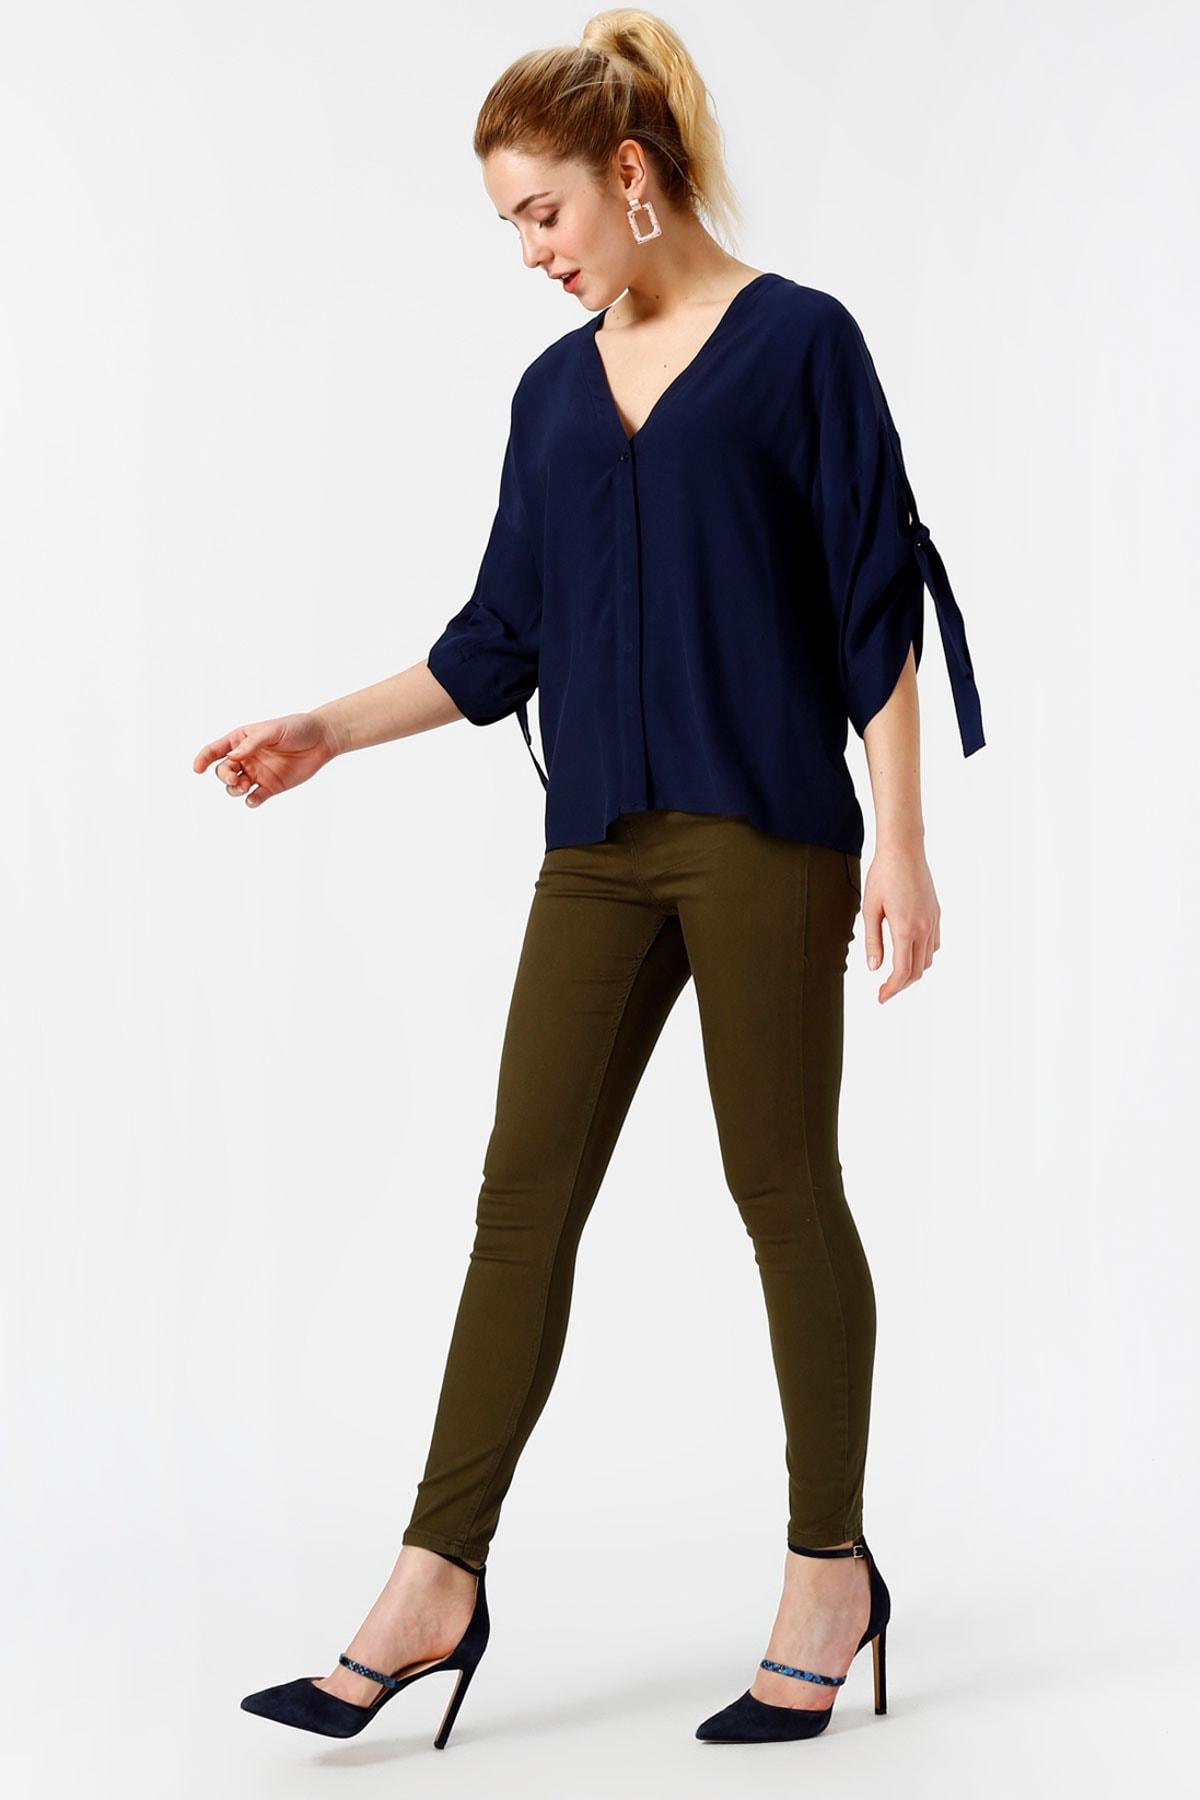 Vero Moda Kadın Yeşil Dar Paça Normal Bel Pantolon 10209868 VMHOT 1